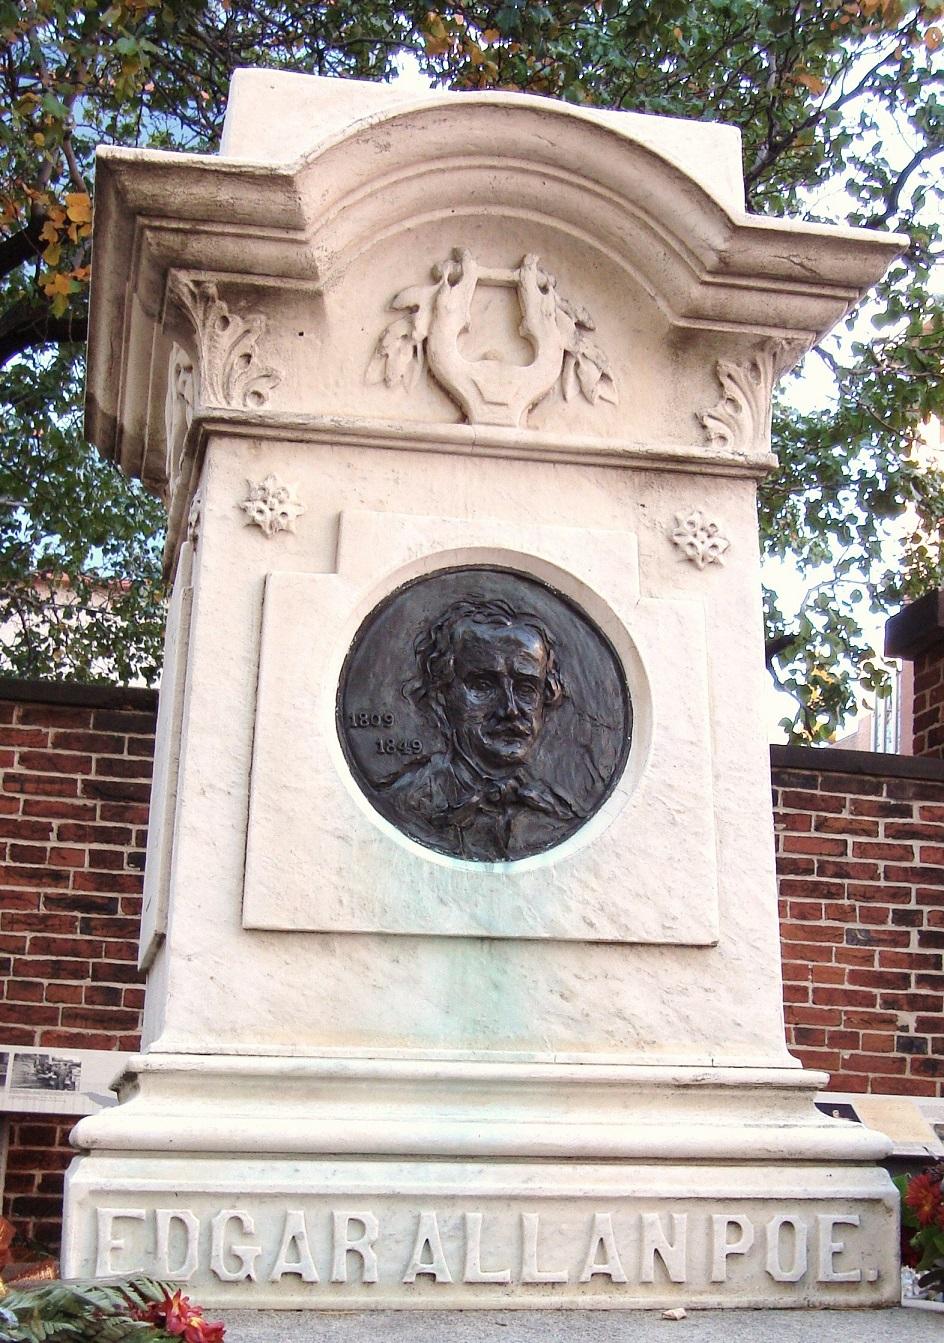 205. Geburtstag Edgar Allan Poe (2014)